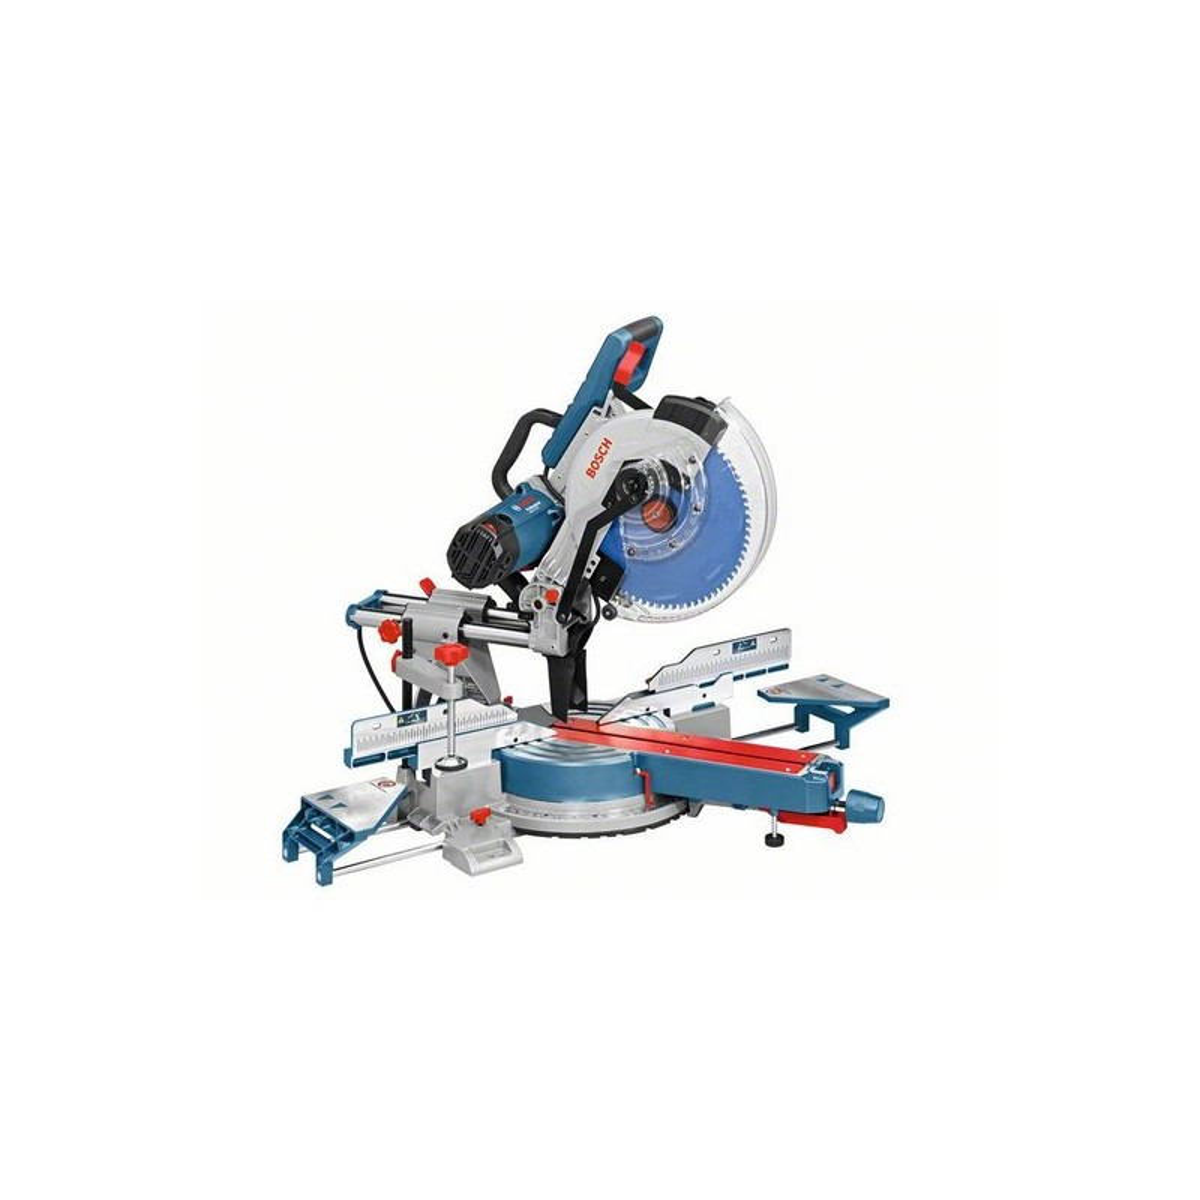 BOSCH Sliding Mitre Saw GCM 12 SDE Professional 0601B23100